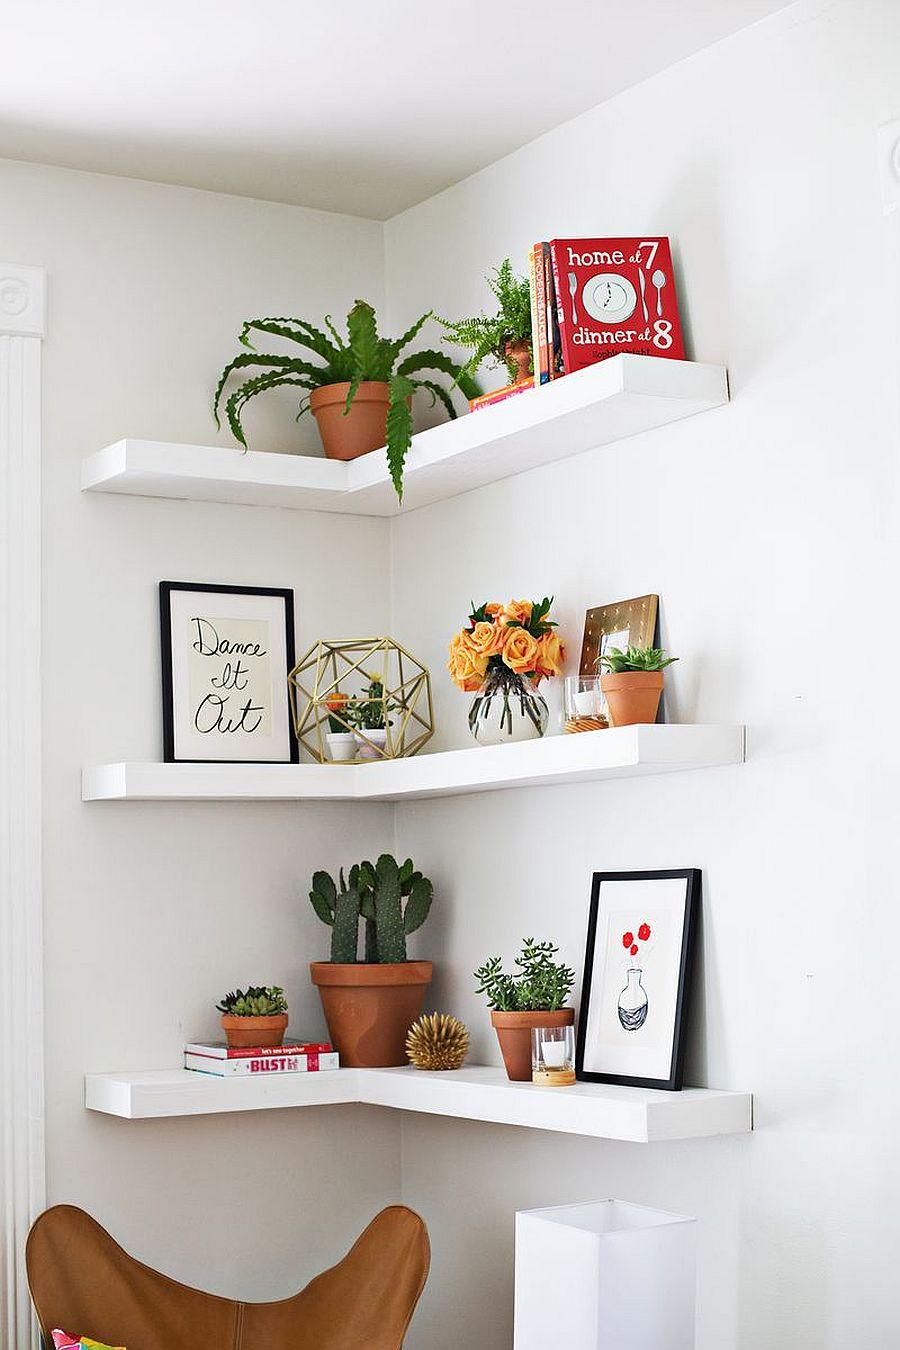 10 Diy Corner Shelf Ideas For Every Room Of Your Home